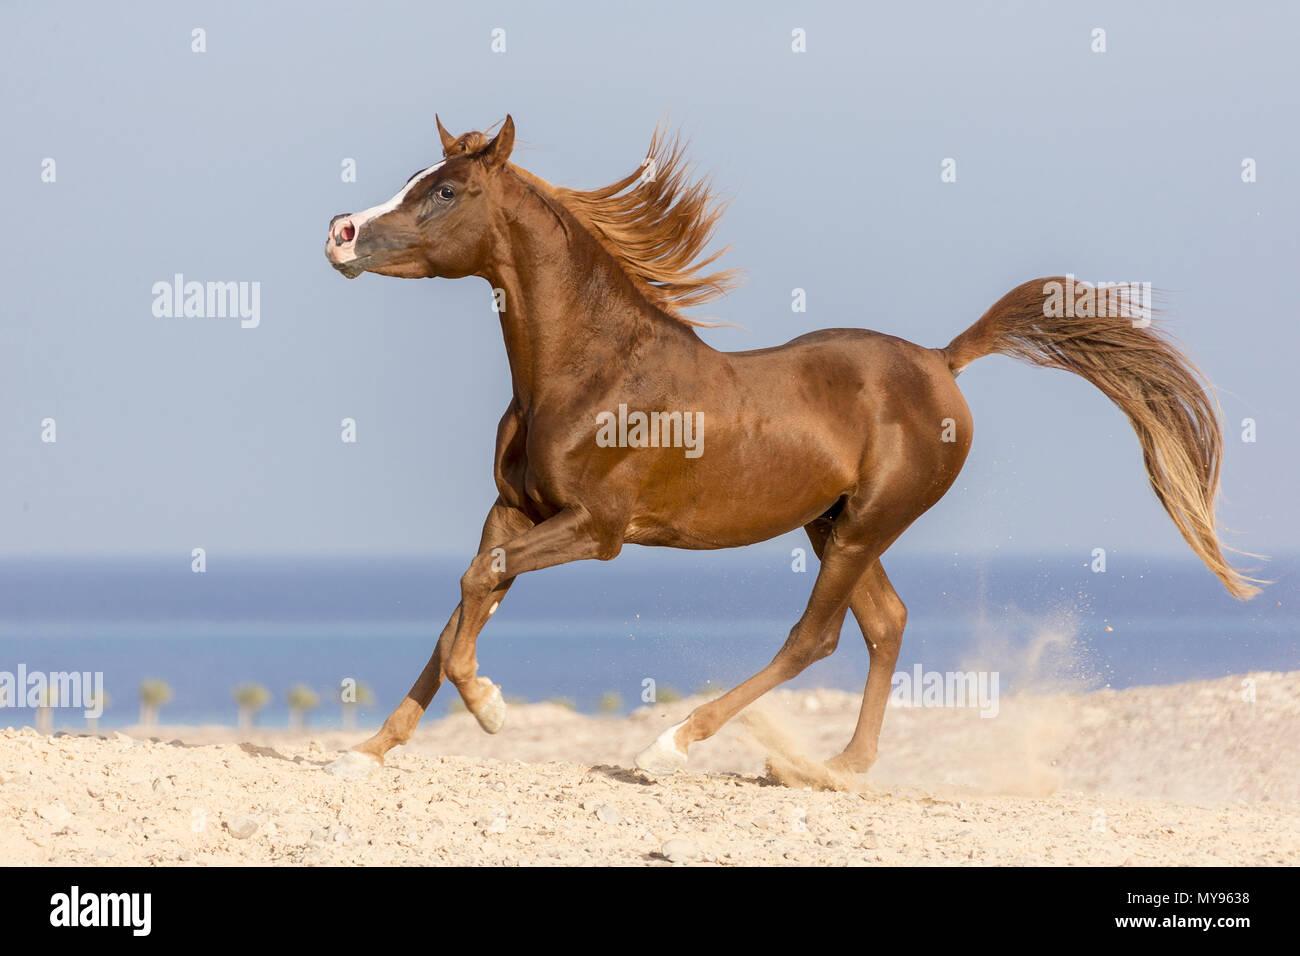 Arabian Horse. Chestnut stallion galloping on a beach. Egypt - Stock Image